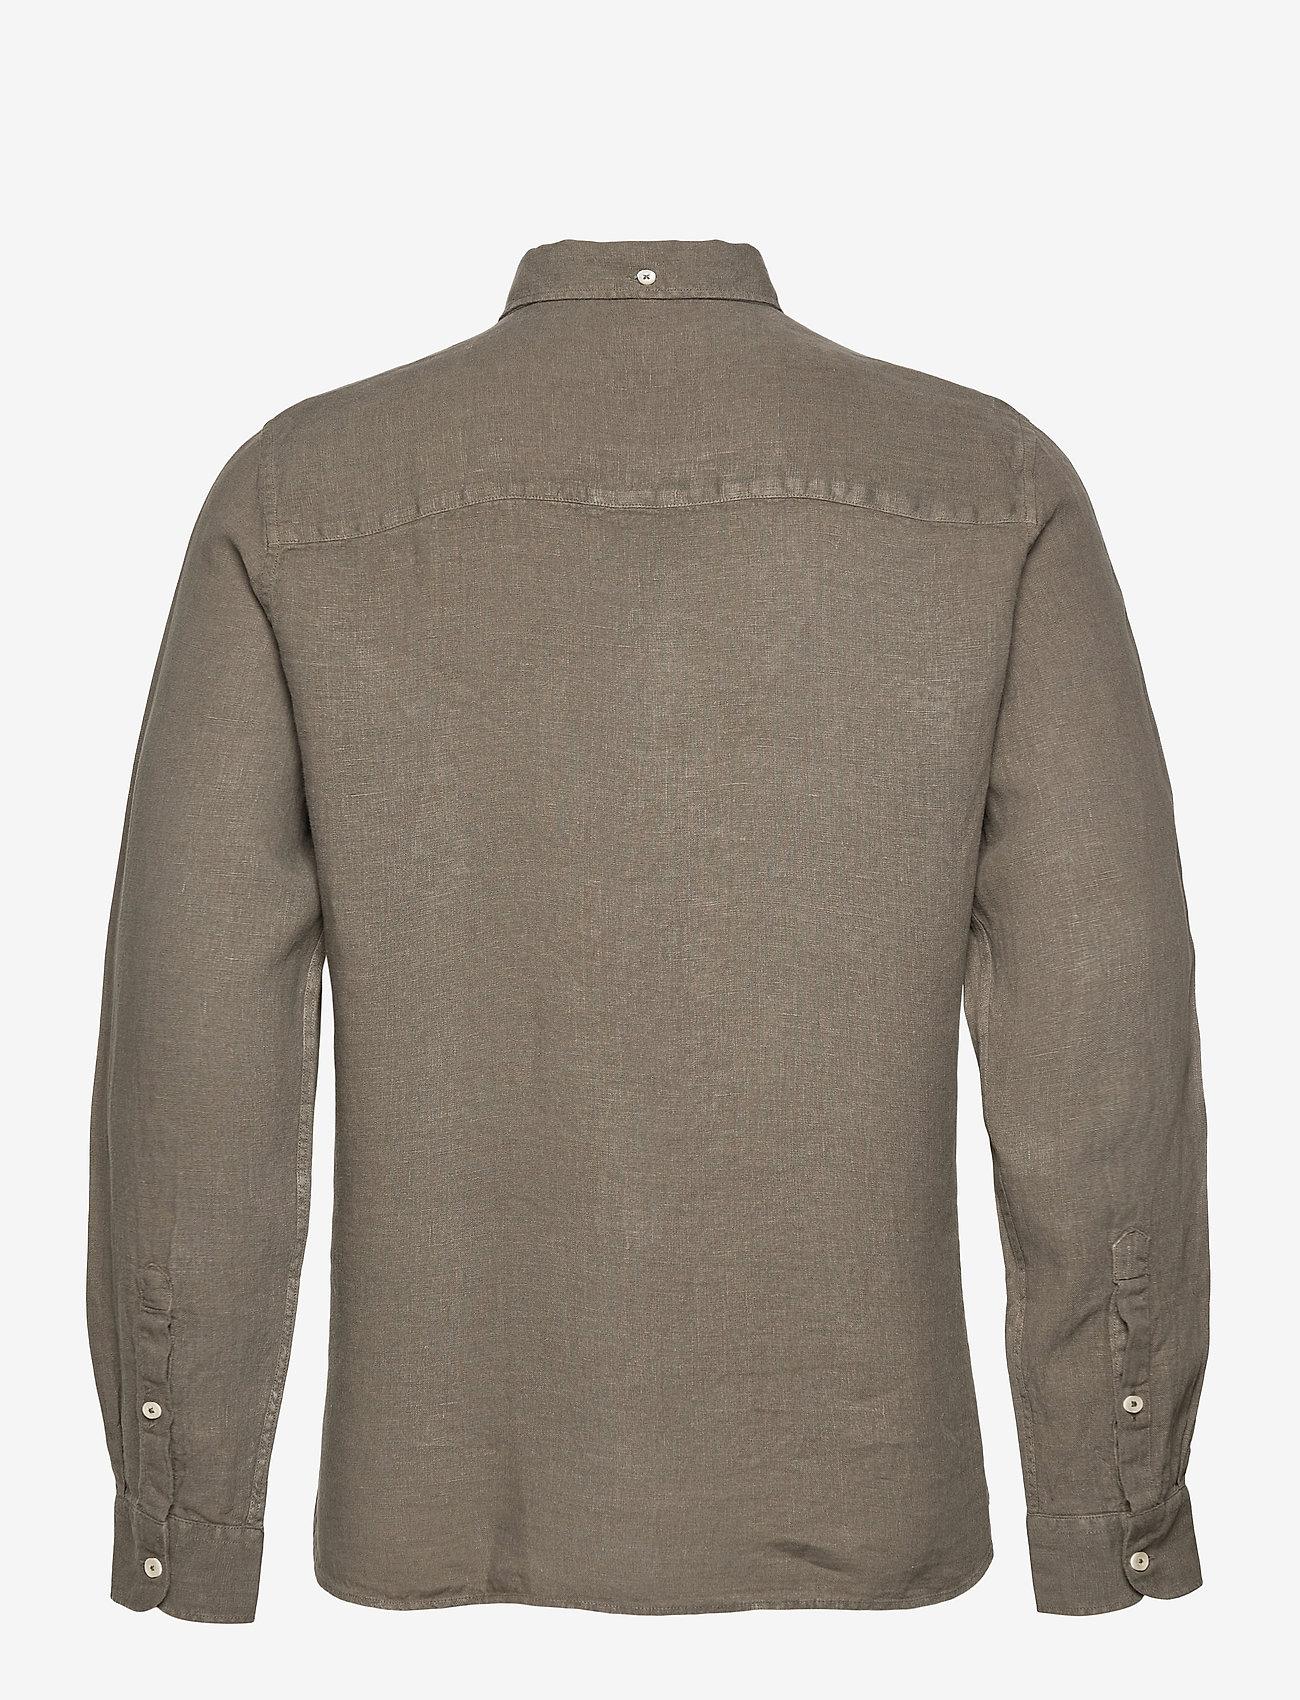 ECOALF - MALIBU SHIRT MAN - geruite overhemden - khaki - 1